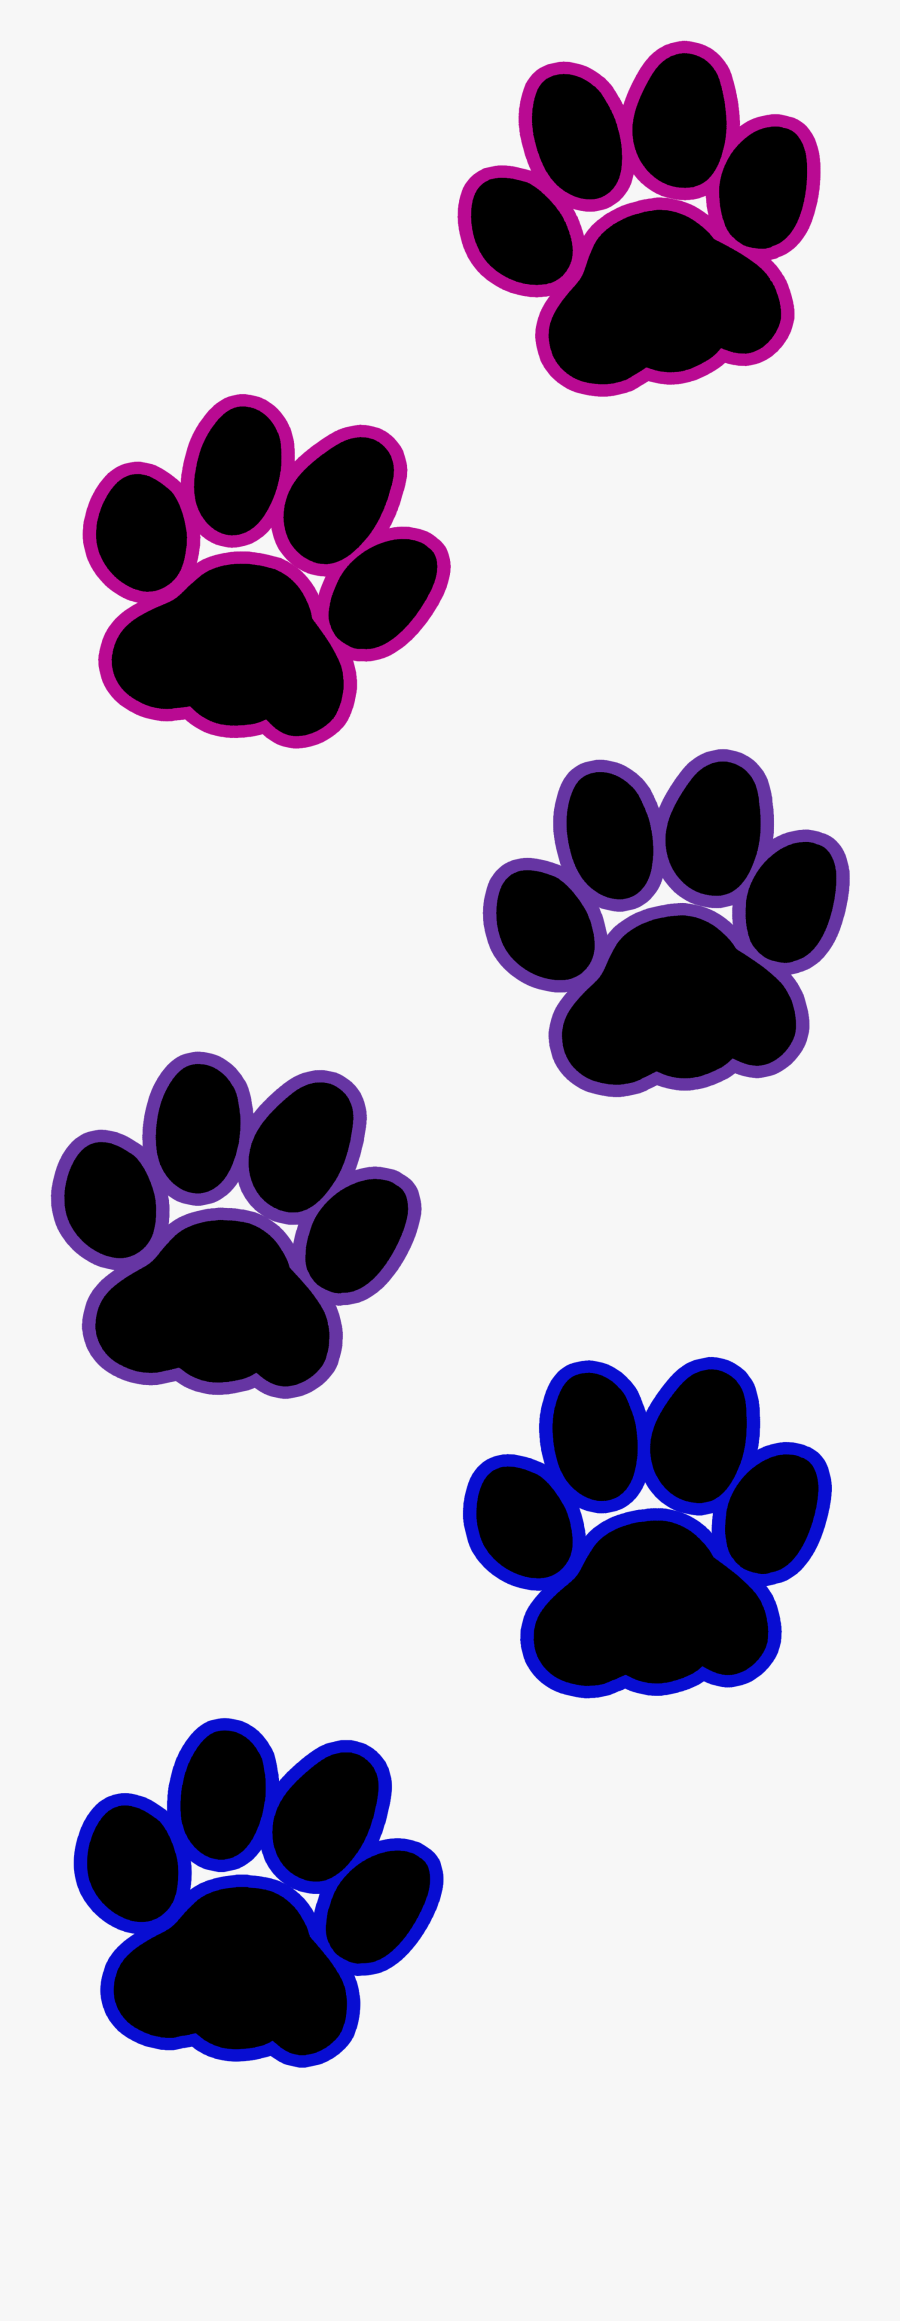 Transparent Cat Paw Print Clip Art, Transparent Clipart